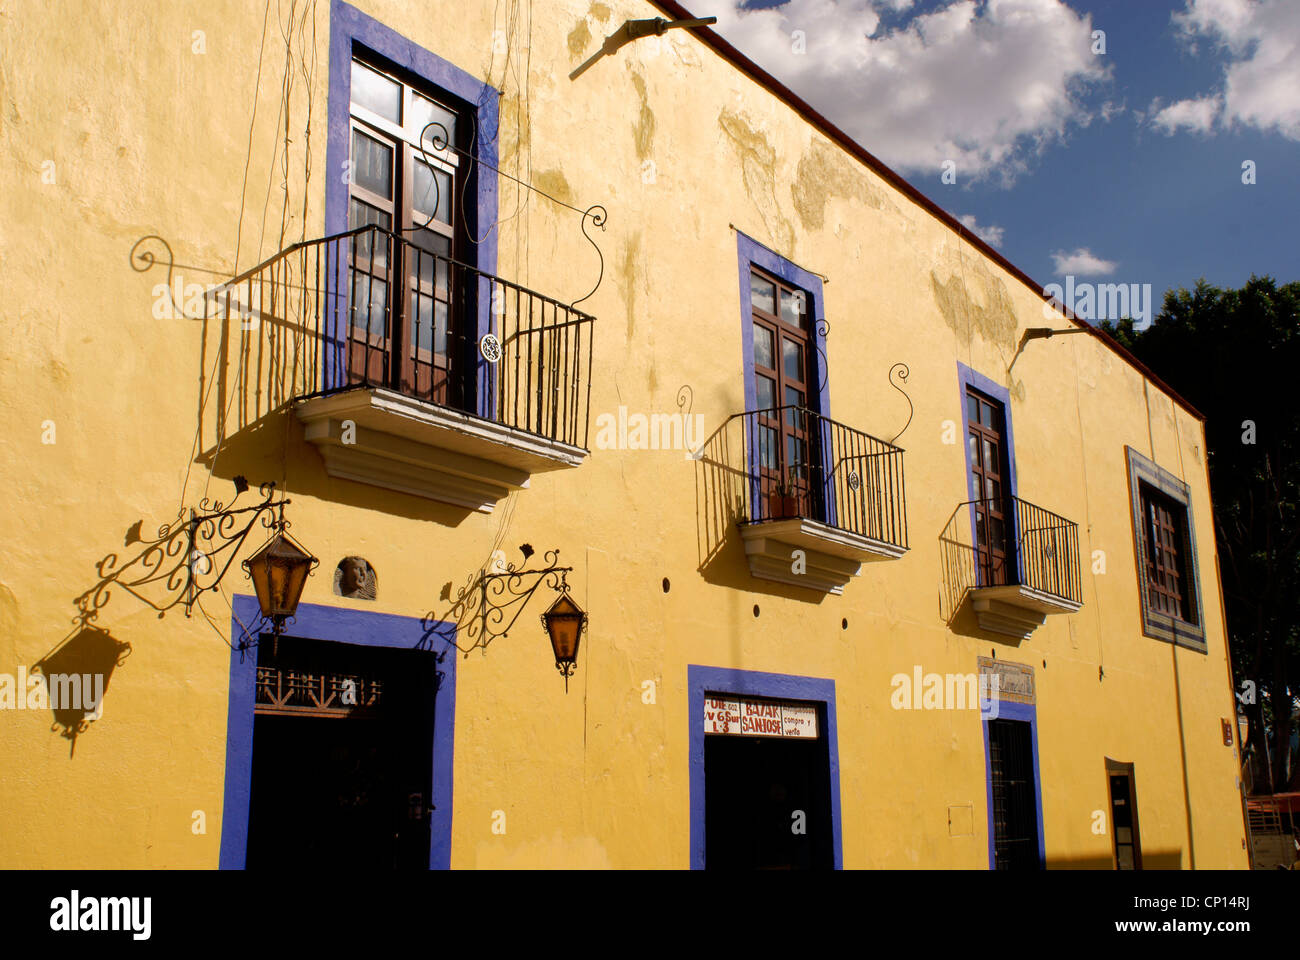 Restored Spanish colonial house on Callejon de los Sapos in the city of Puebla, Mexico. - Stock Image